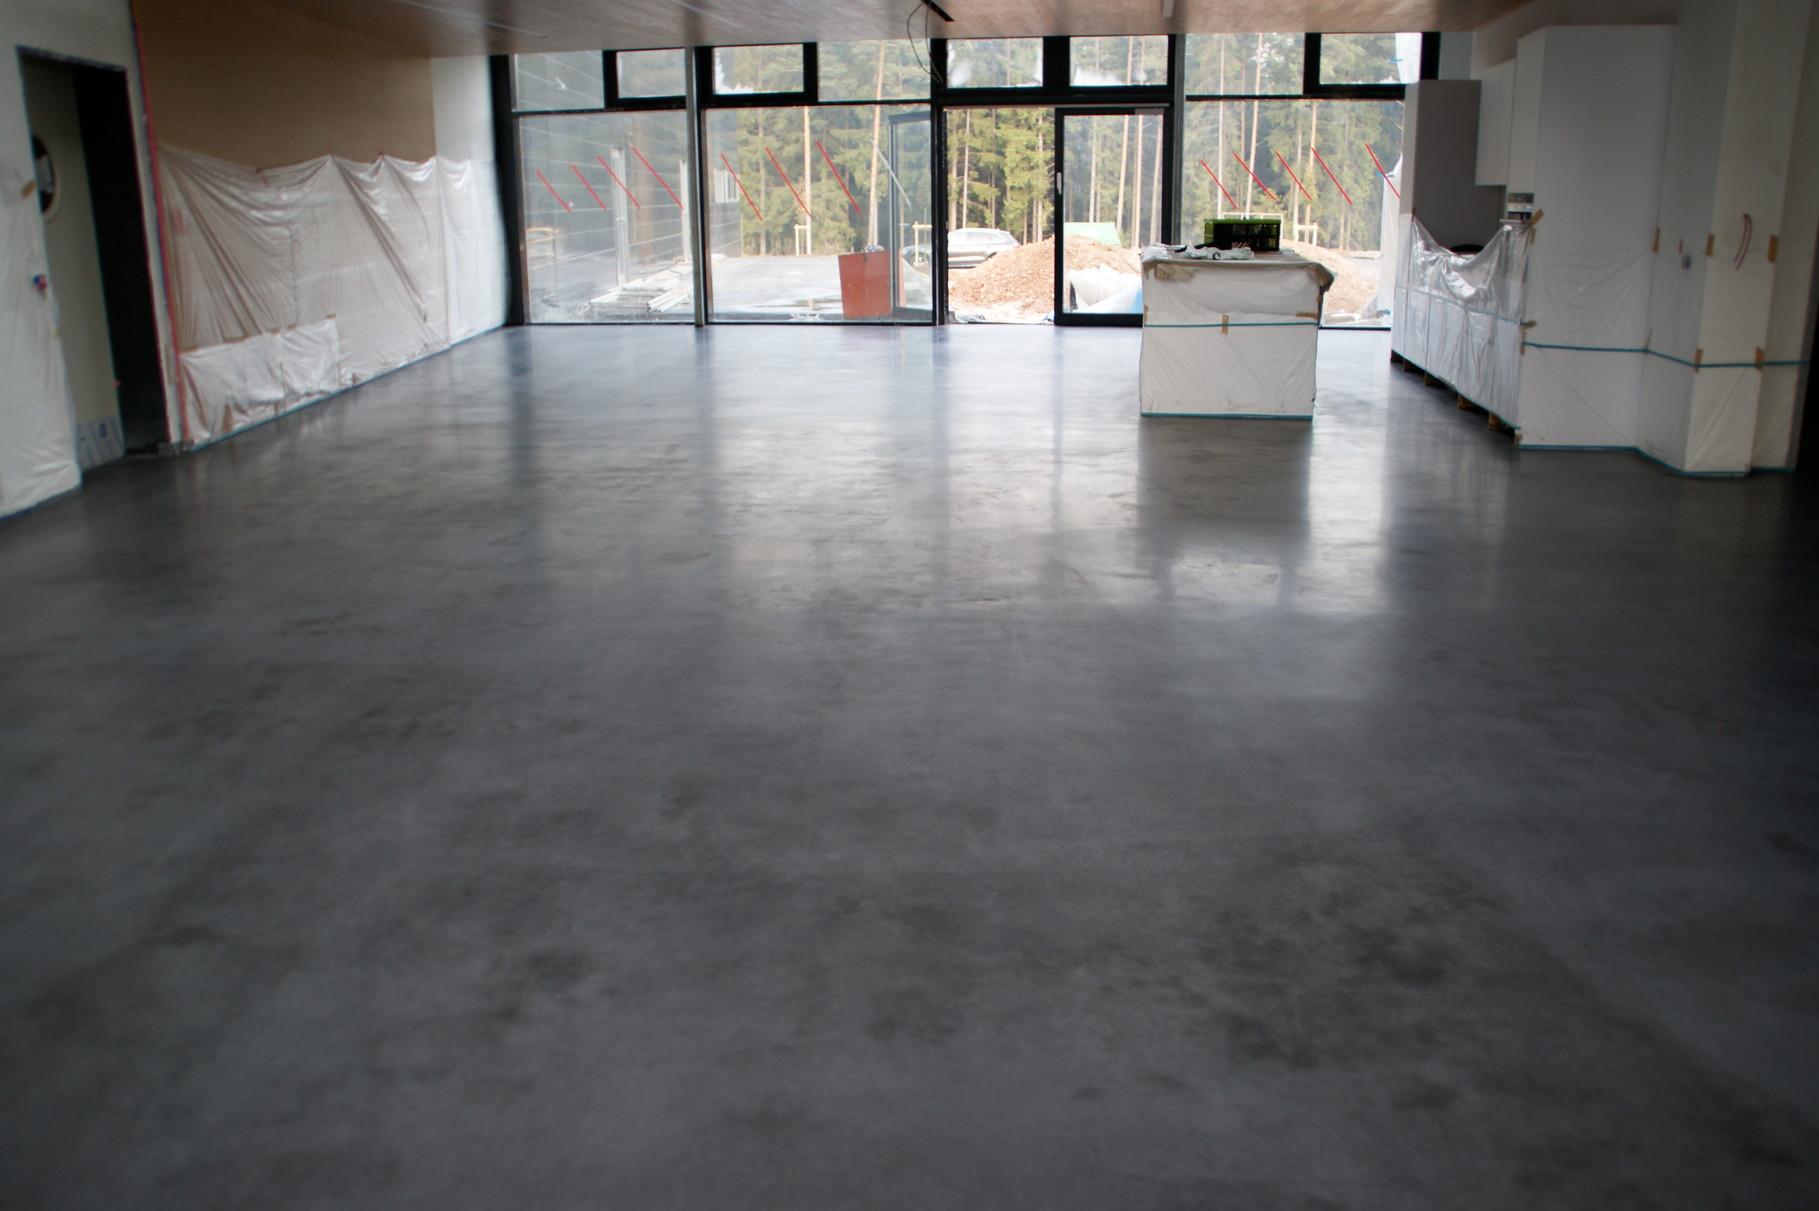 designestrichb den polierte betonb den industrieestriche in terrazzo optik magnesiaestriche. Black Bedroom Furniture Sets. Home Design Ideas